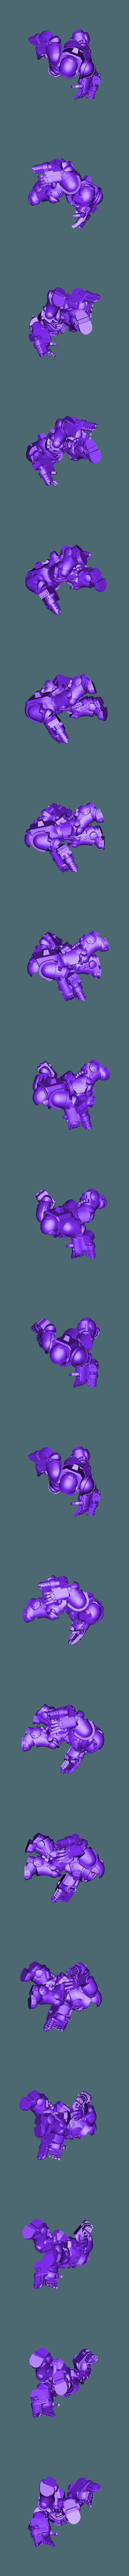 Aggressor_1_body.stl Download free STL file Flame Armed Instigators • 3D printable template, danny_cyanide